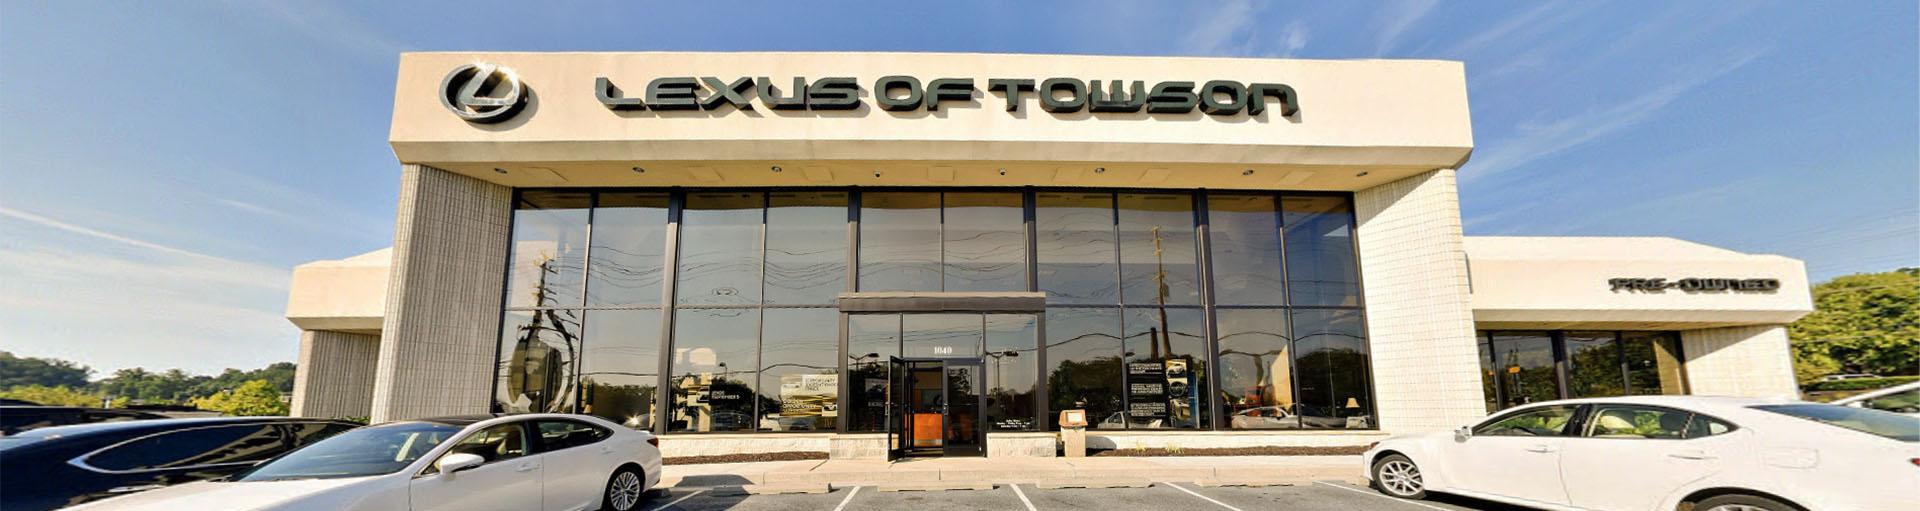 Lexus of Towson Tire Department